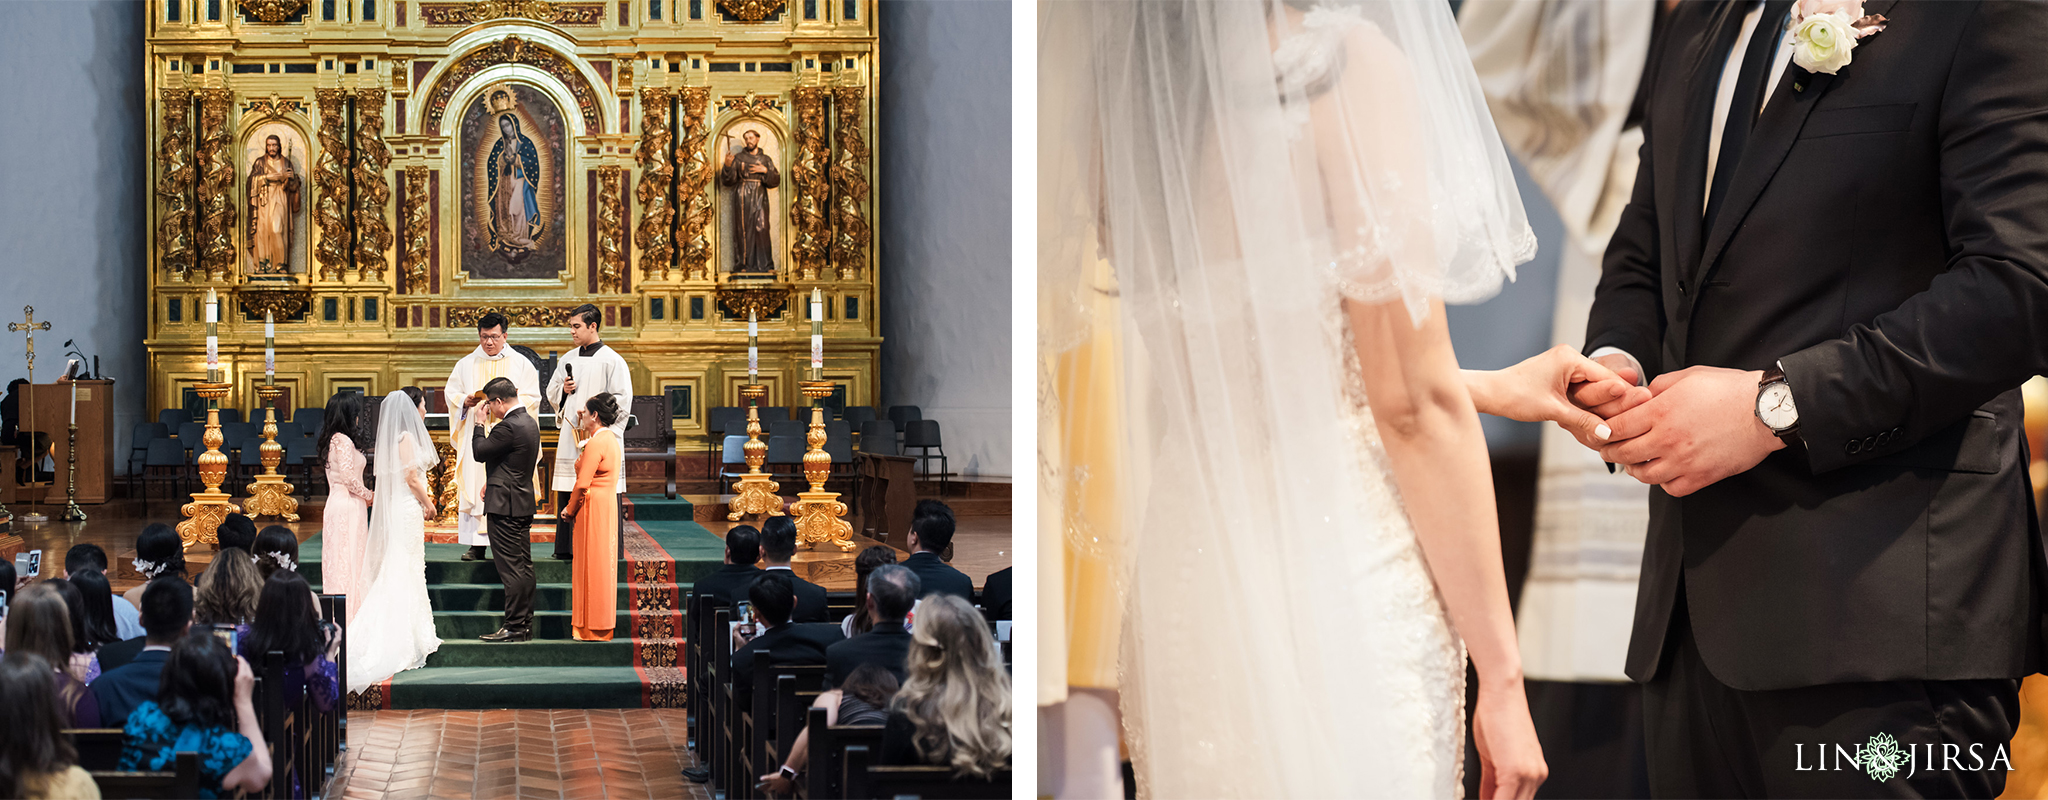 17 Mission Basilica San Juan Capistrano Wedding Photography